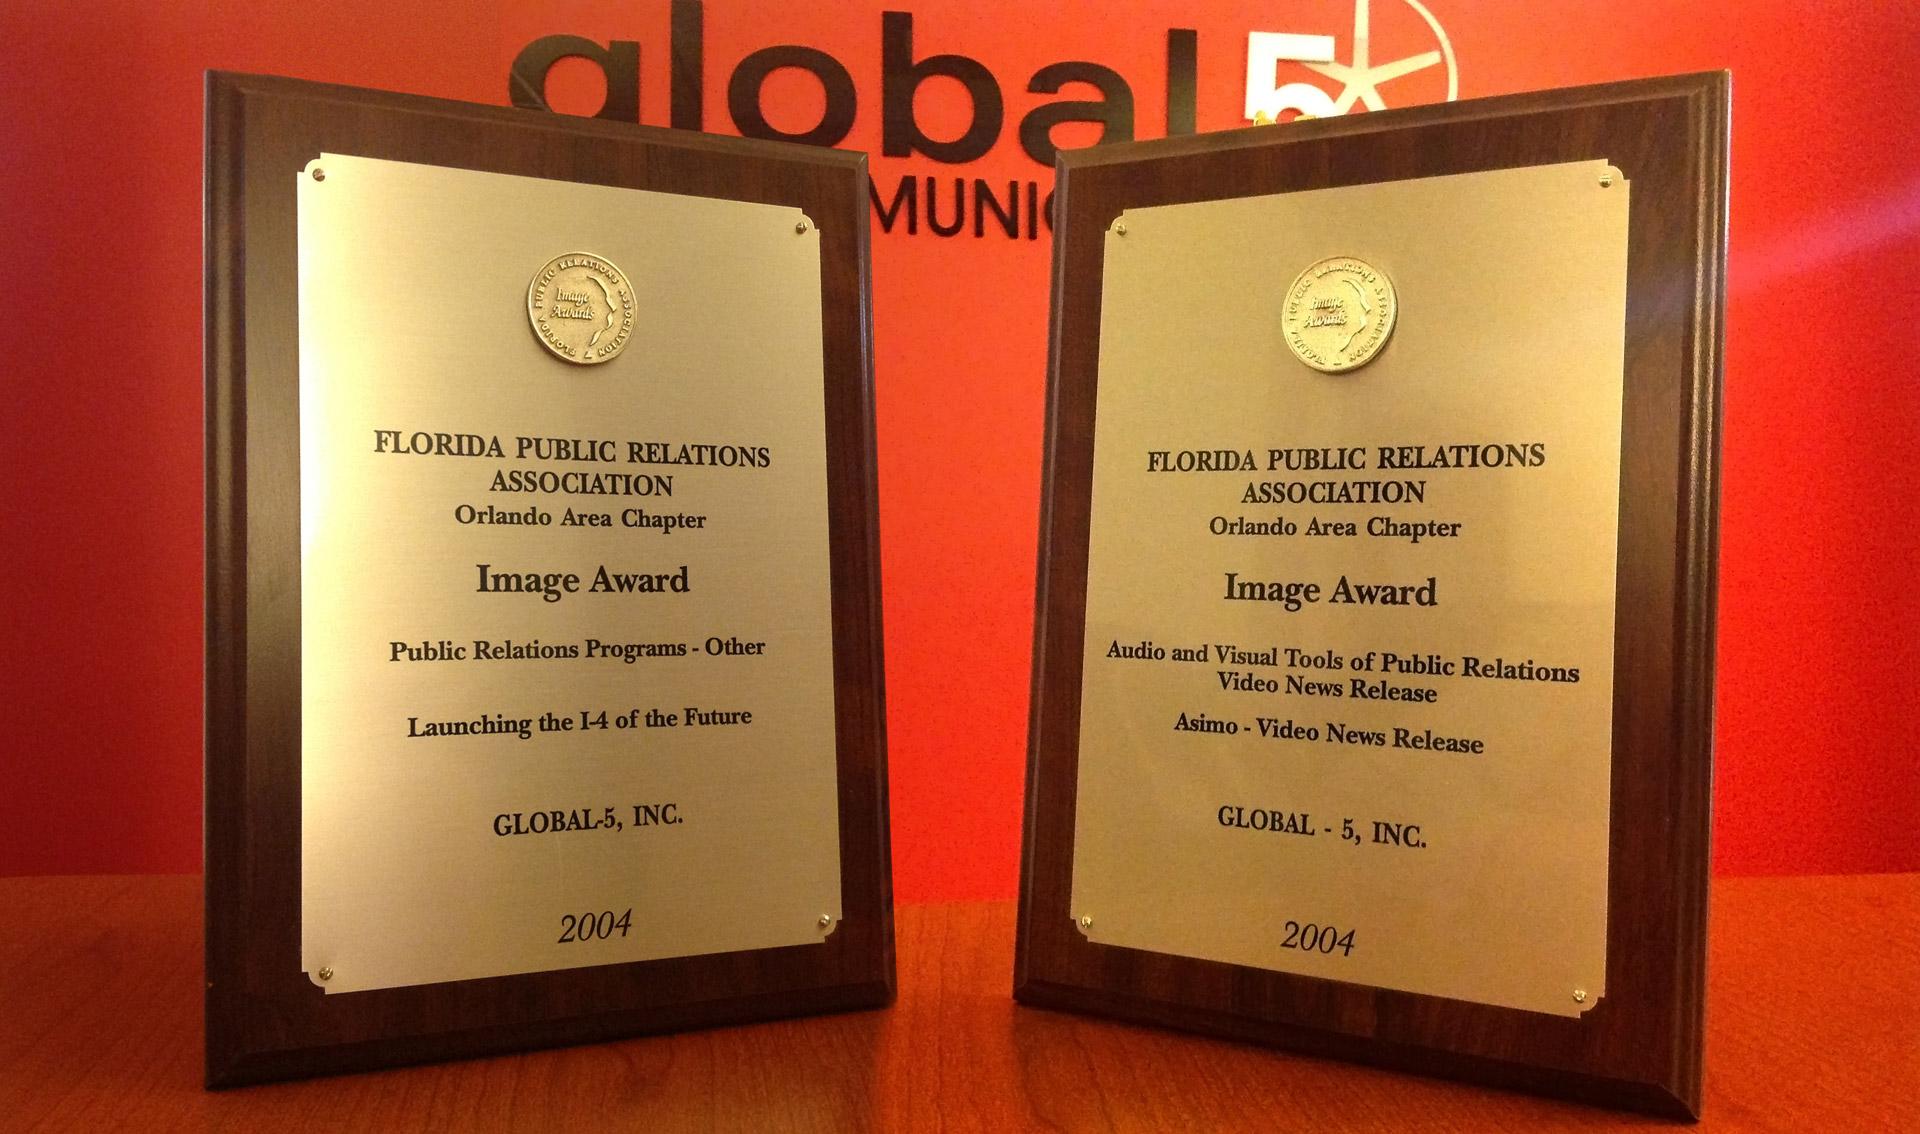 FPRA's 2004 Image Awards and Grand Image Award